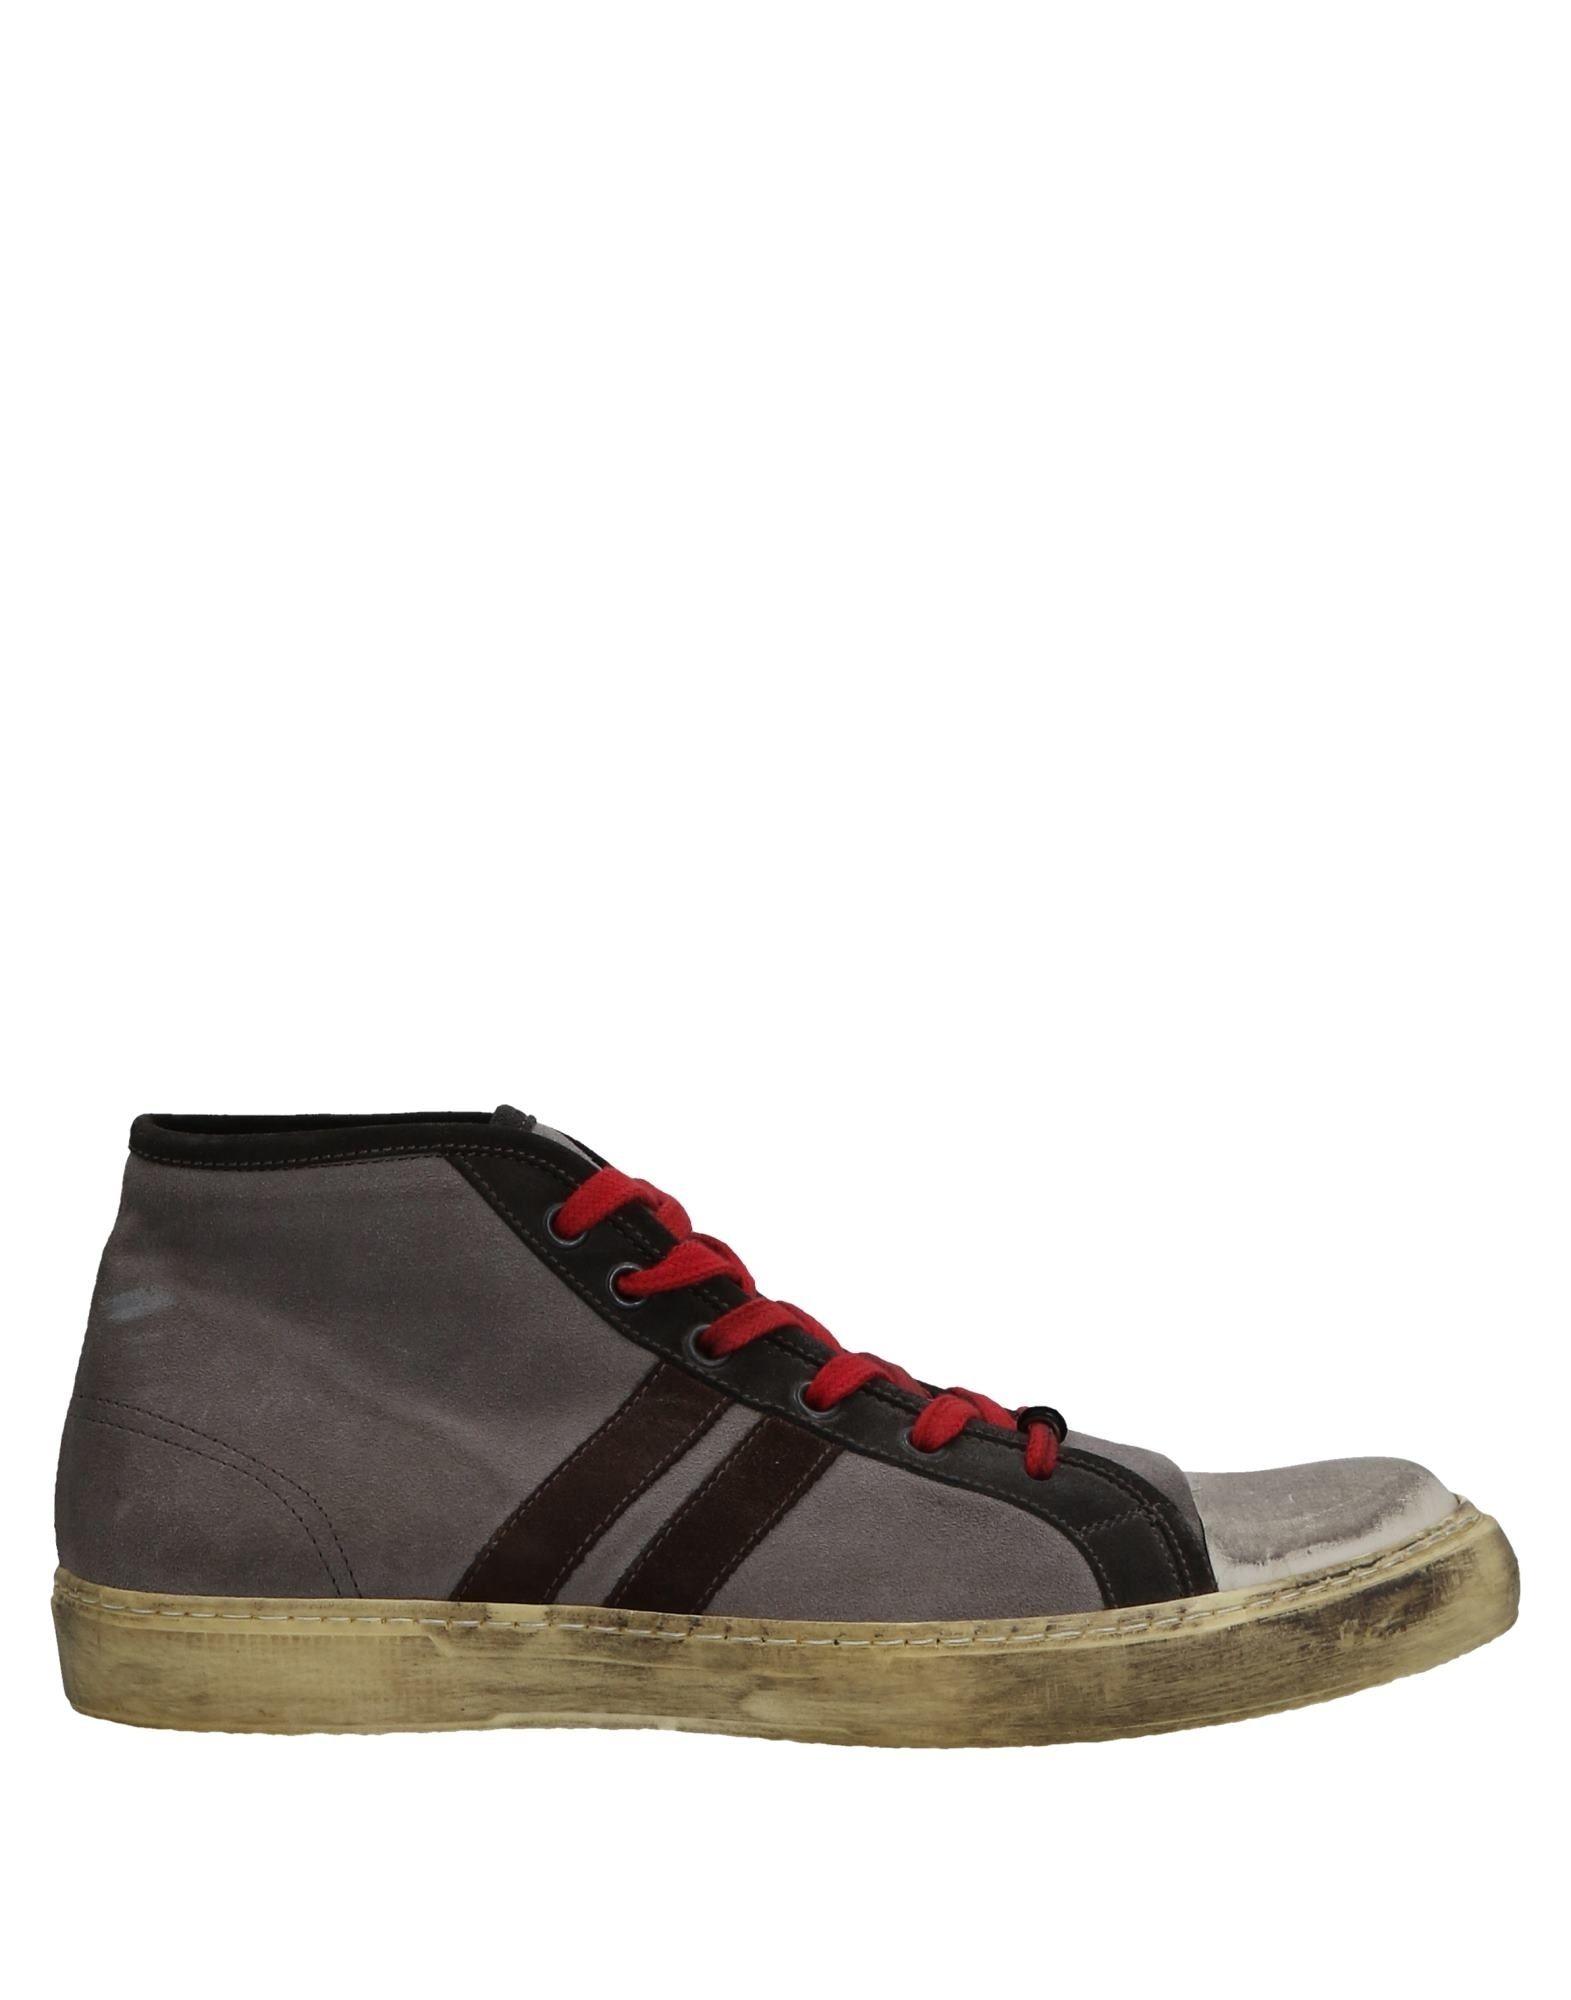 Daniele Alessandrini Daniele Homme Sneakers - Men Daniele Alessandrini Alessandrini Homme Sneakers online on  Canada - 11531840RN 1463d0